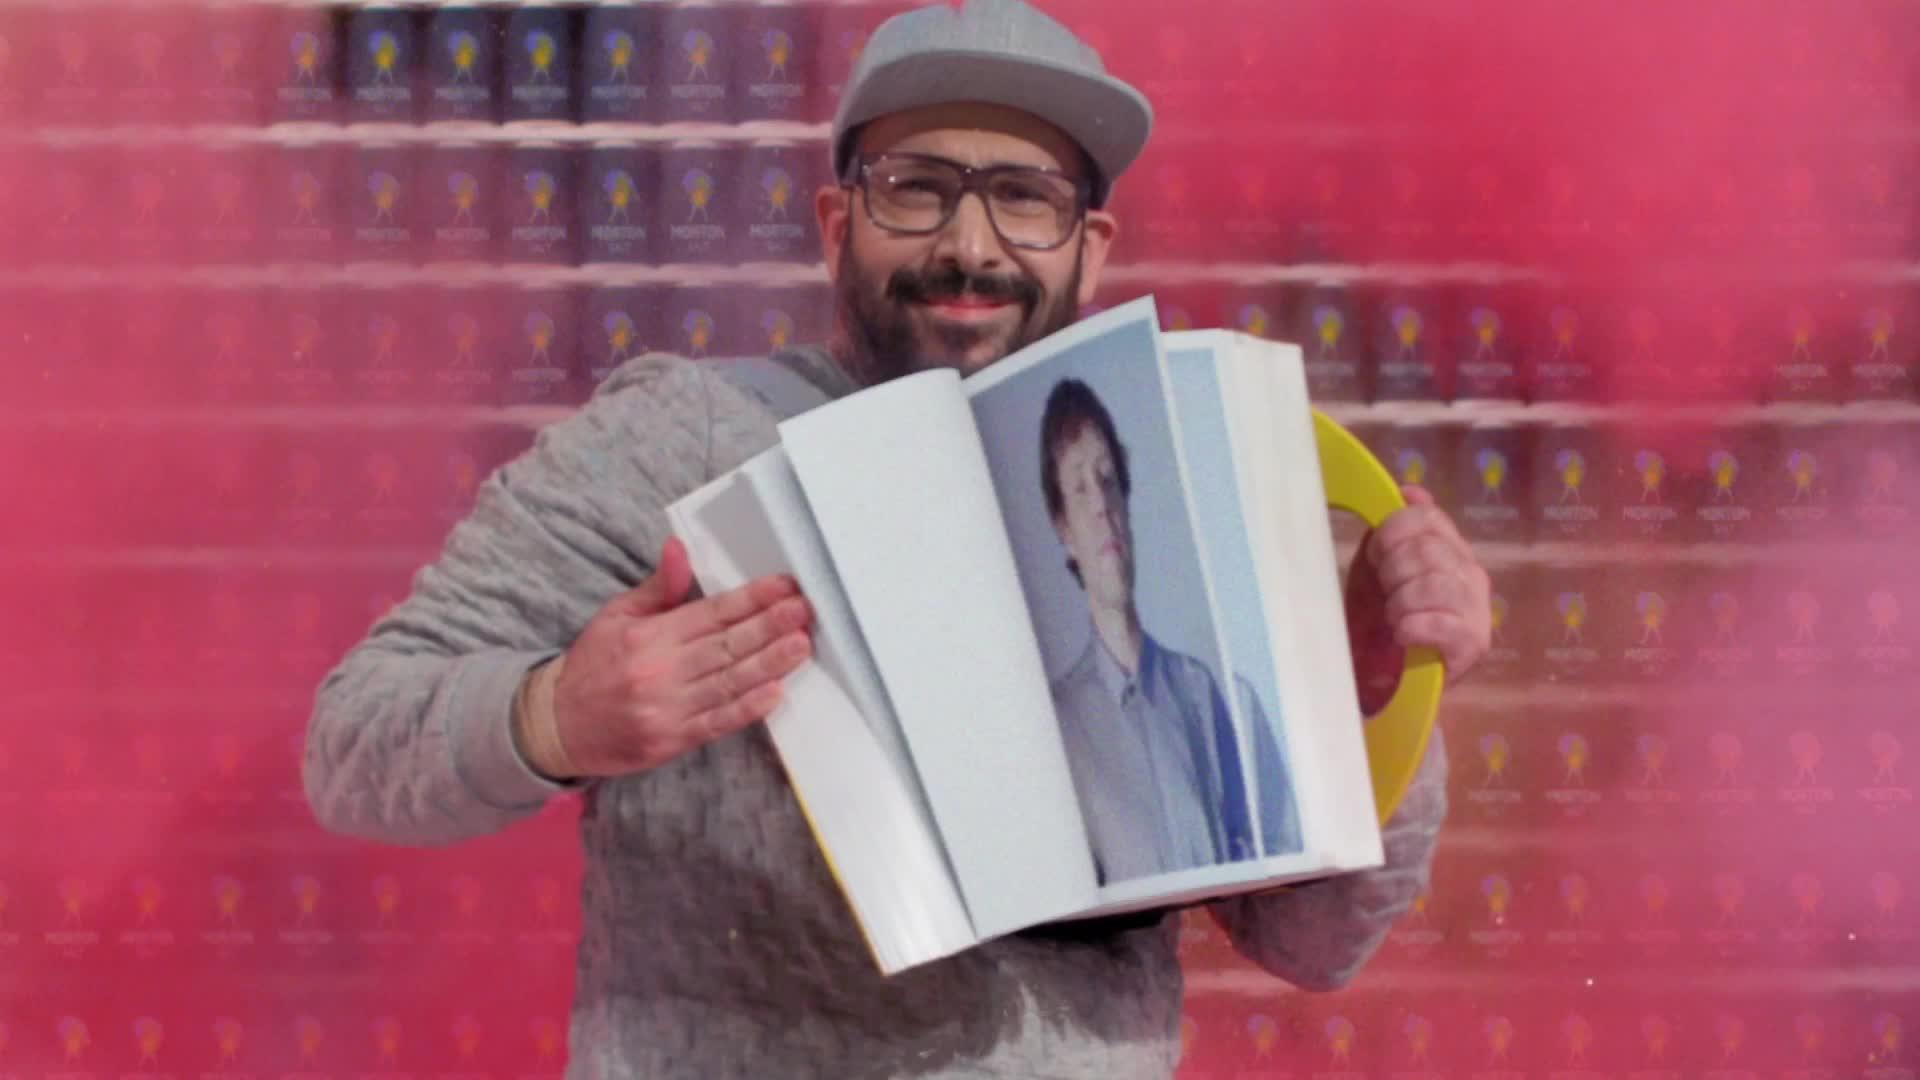 Damian Kulash, OK Go, The One Moment, Tim Nordwind, moment, morton, music, okgo, one, theonemoment, Tim Flips the Book of Damian - OK Go GIFs